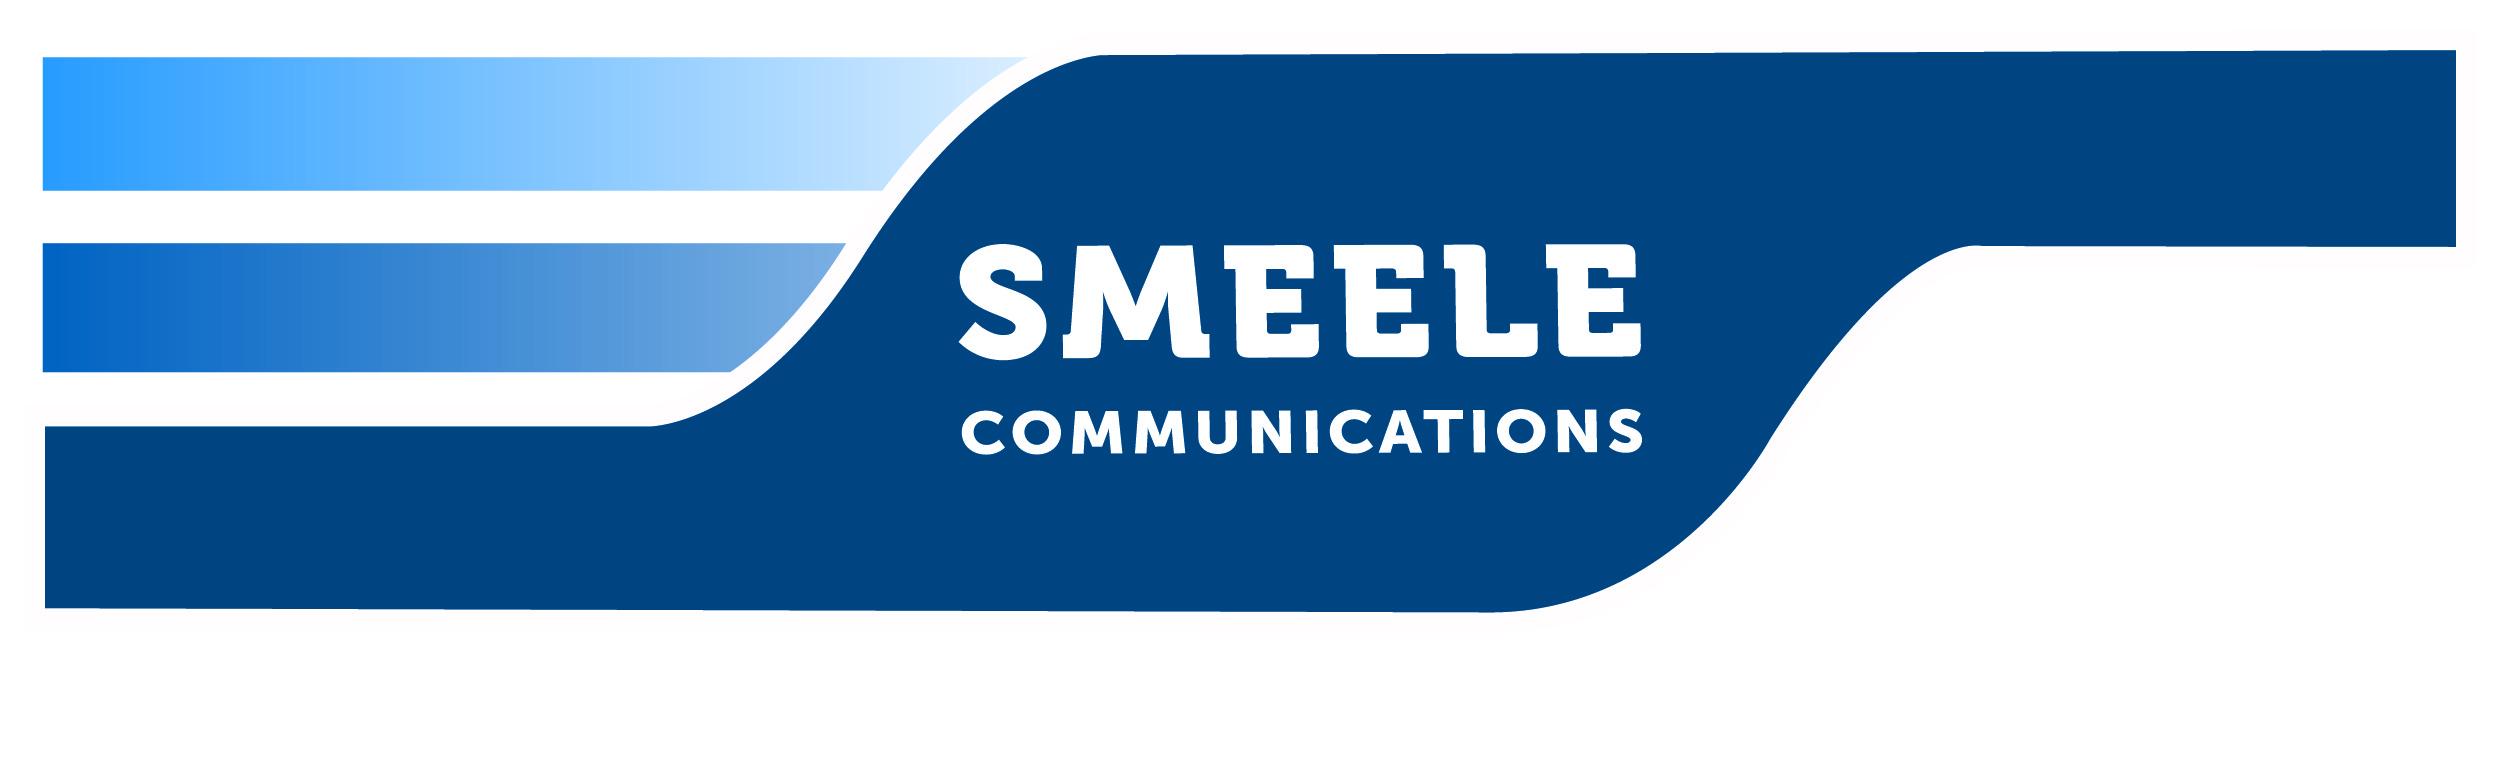 Smeele Communications